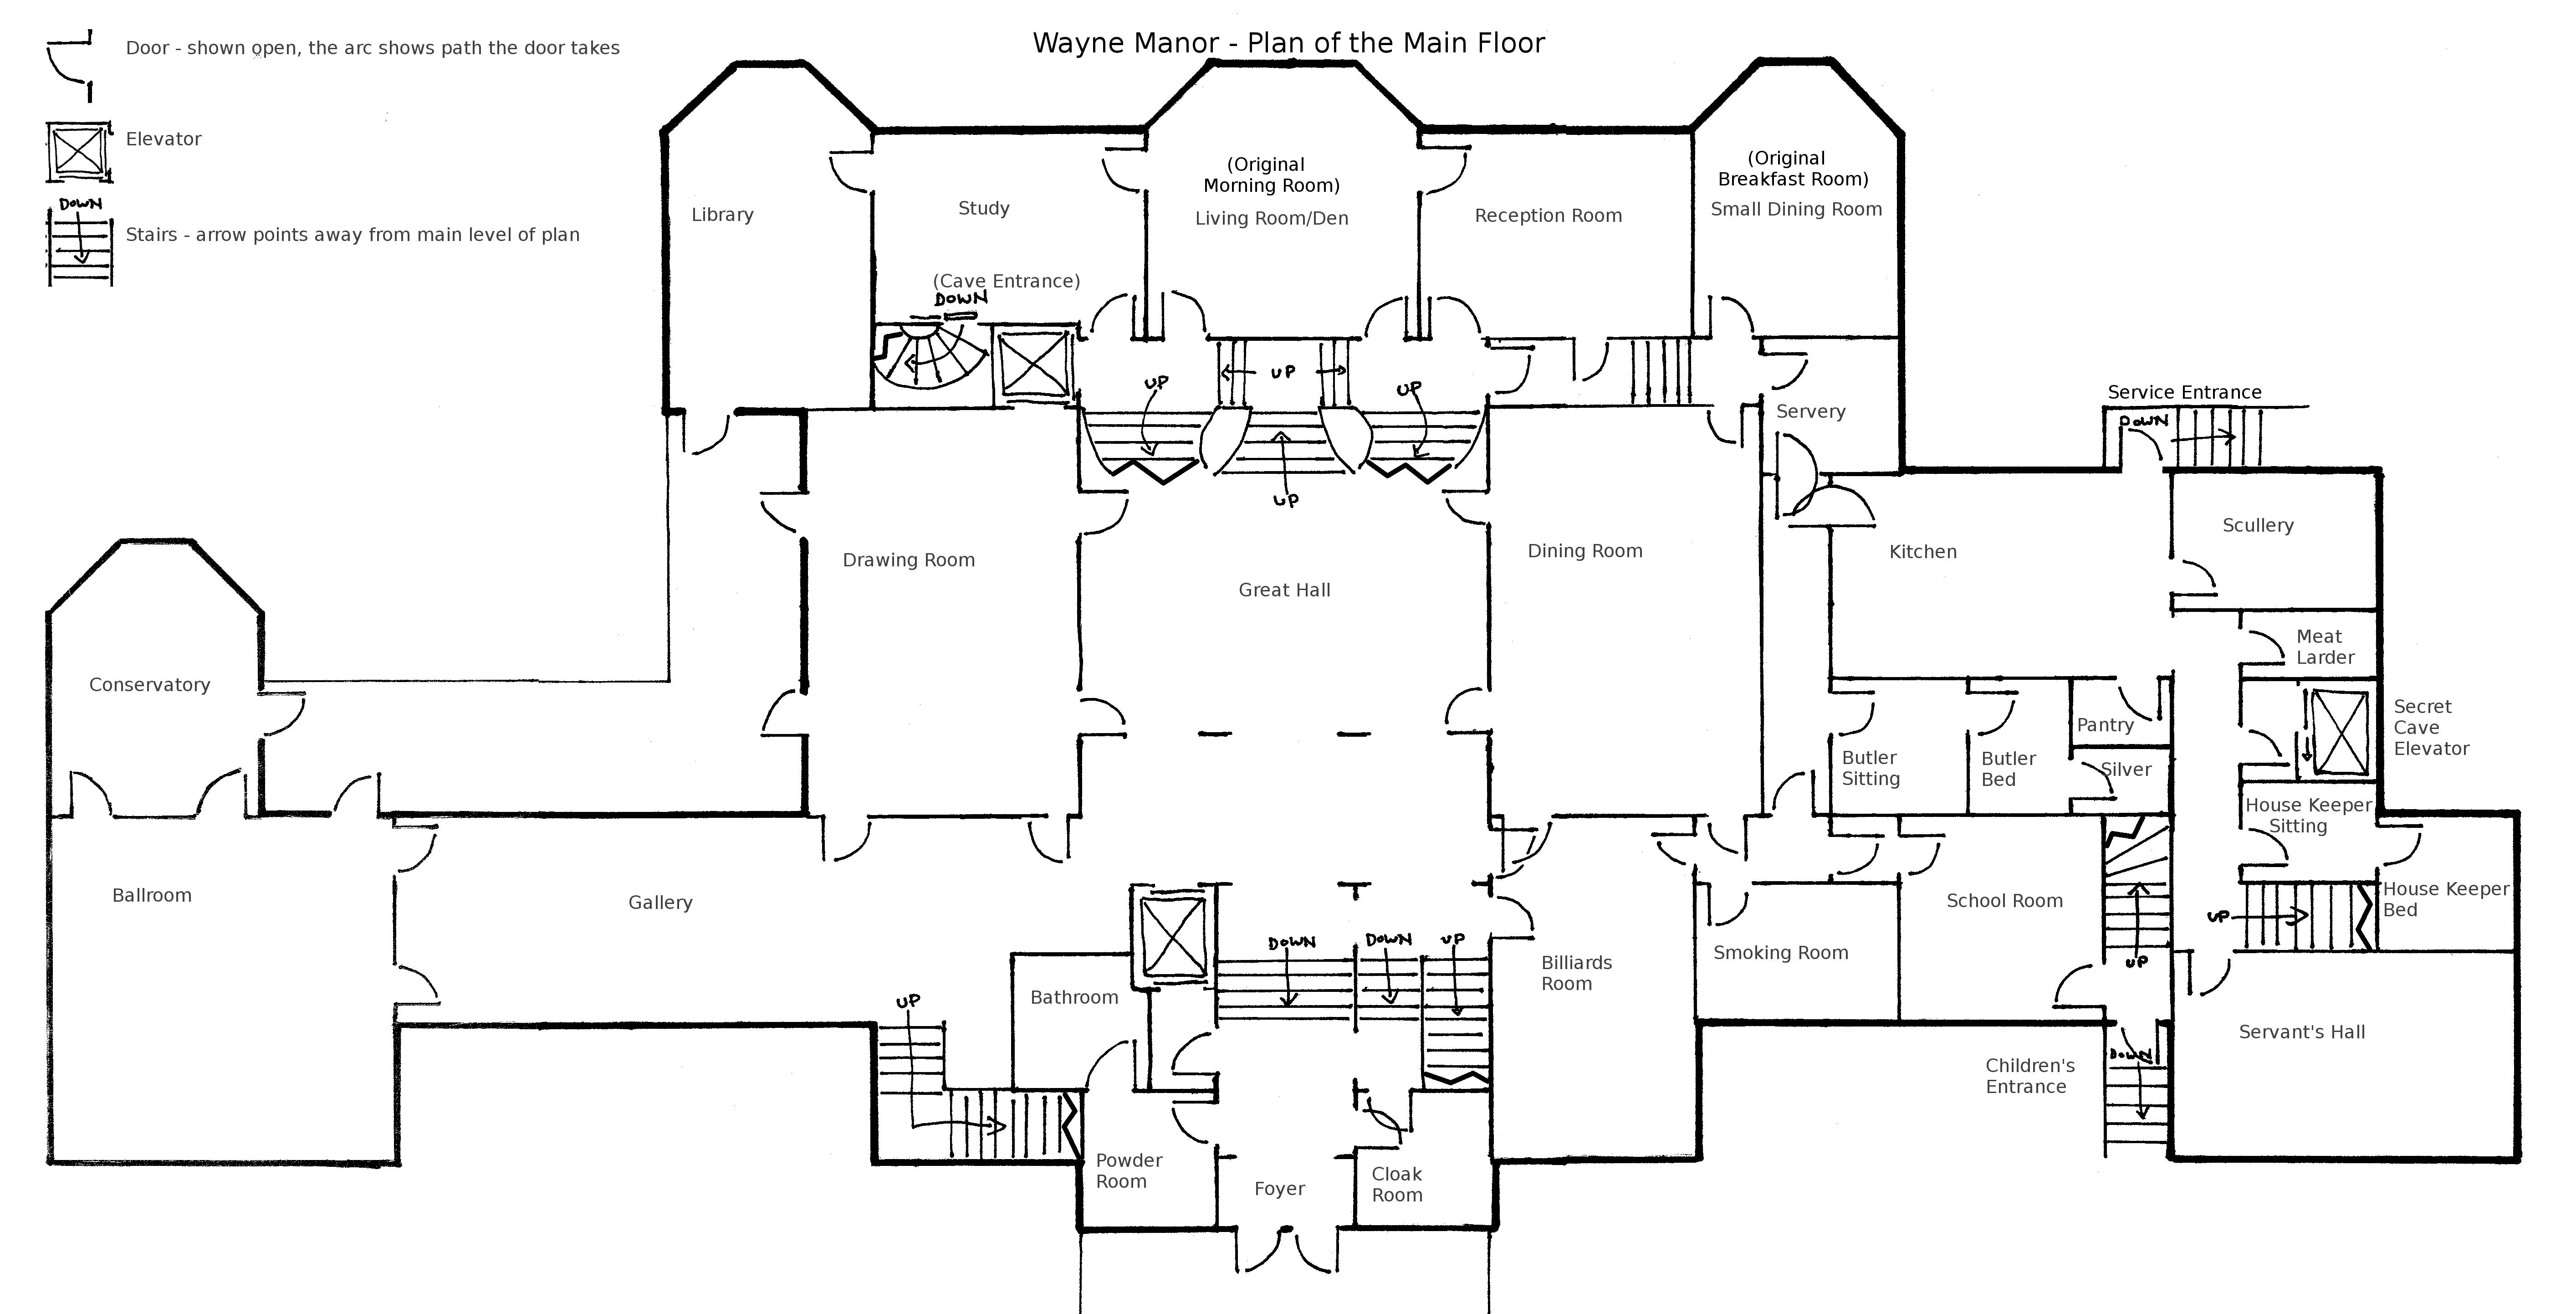 Wayne Manor Main Floor Plan By Geckobot On Deviantart